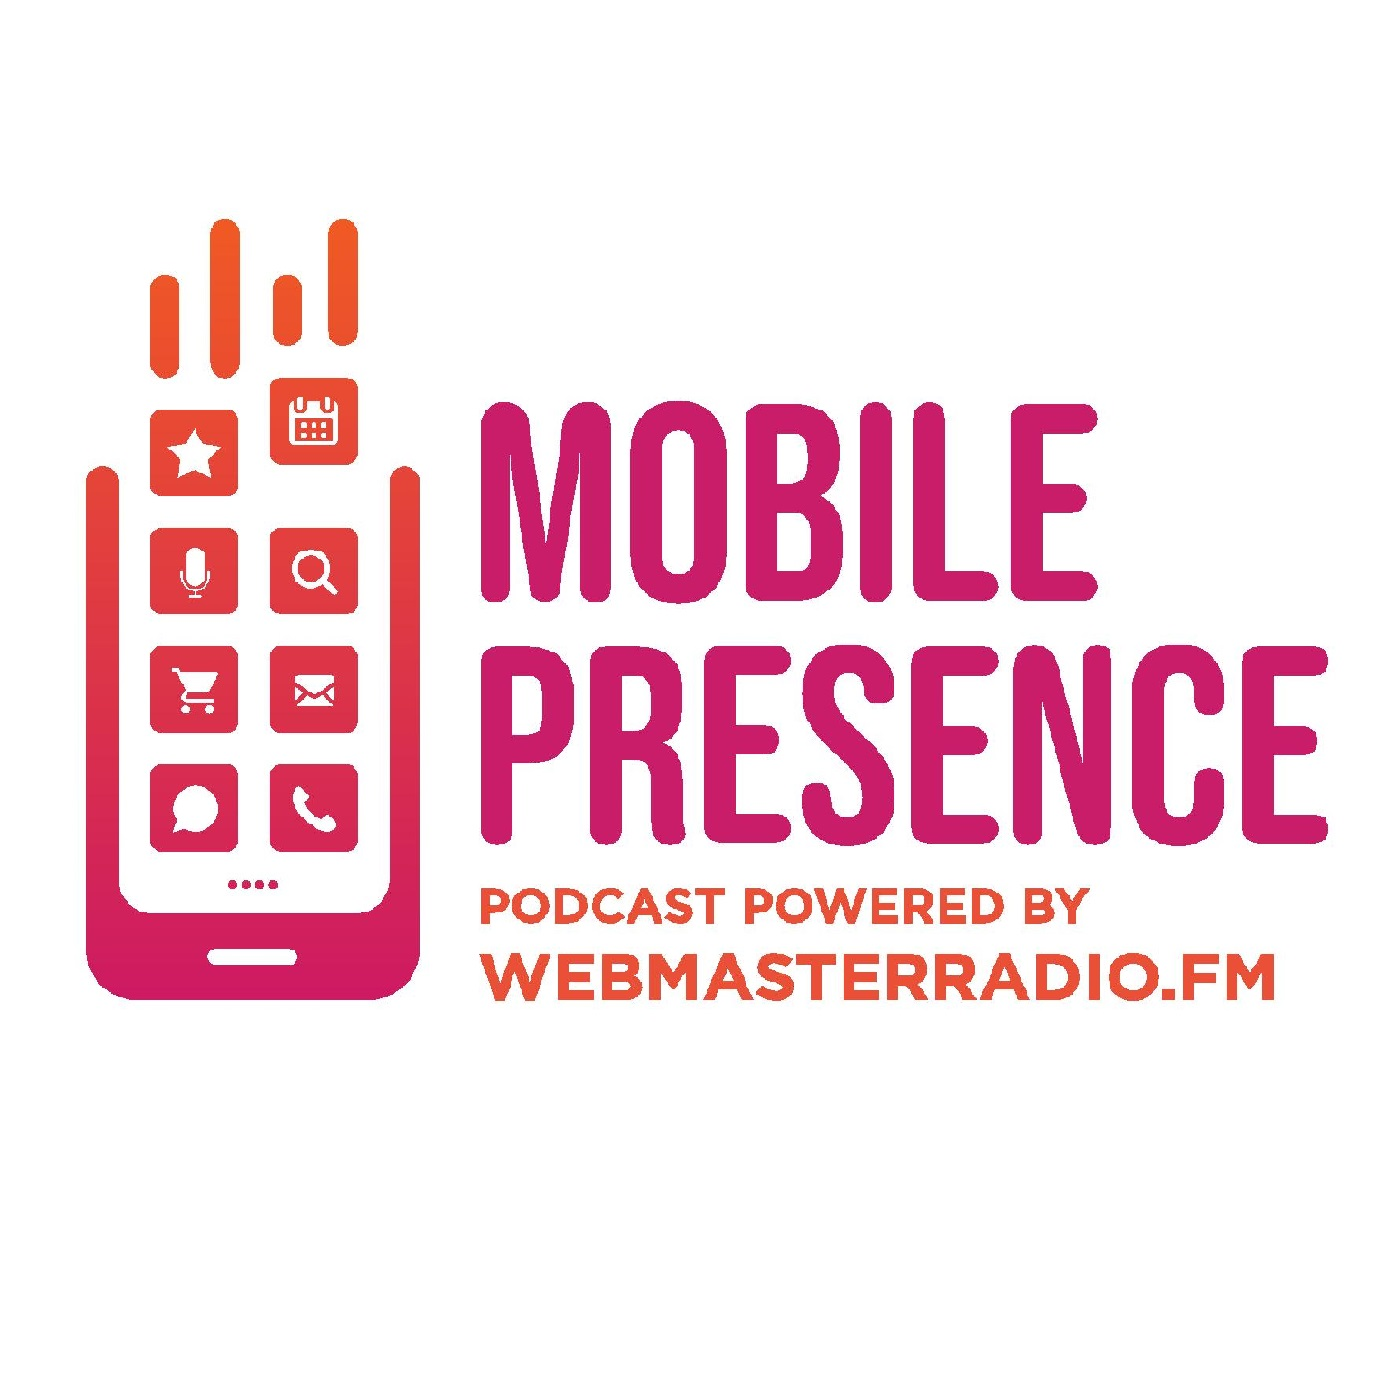 Mobile Presence on WebmasterRadio fm on Apple Podcasts